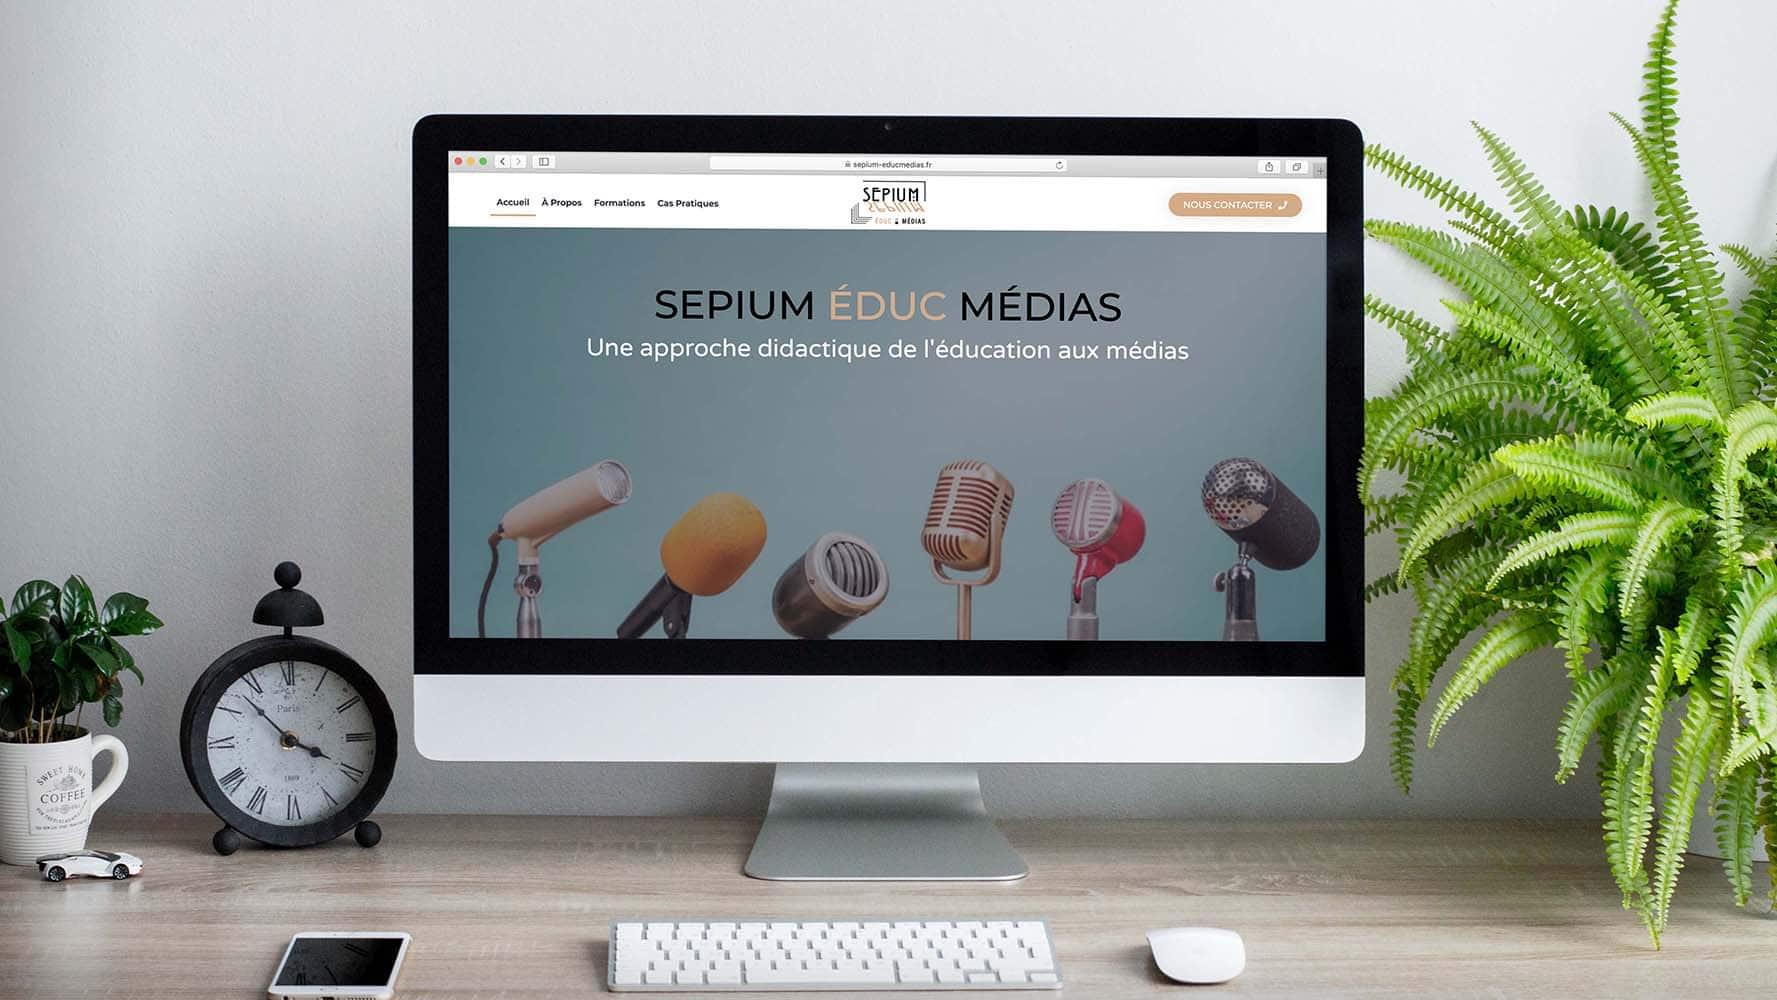 Site vitrine Sepium Éduc Médias par JLF Agency